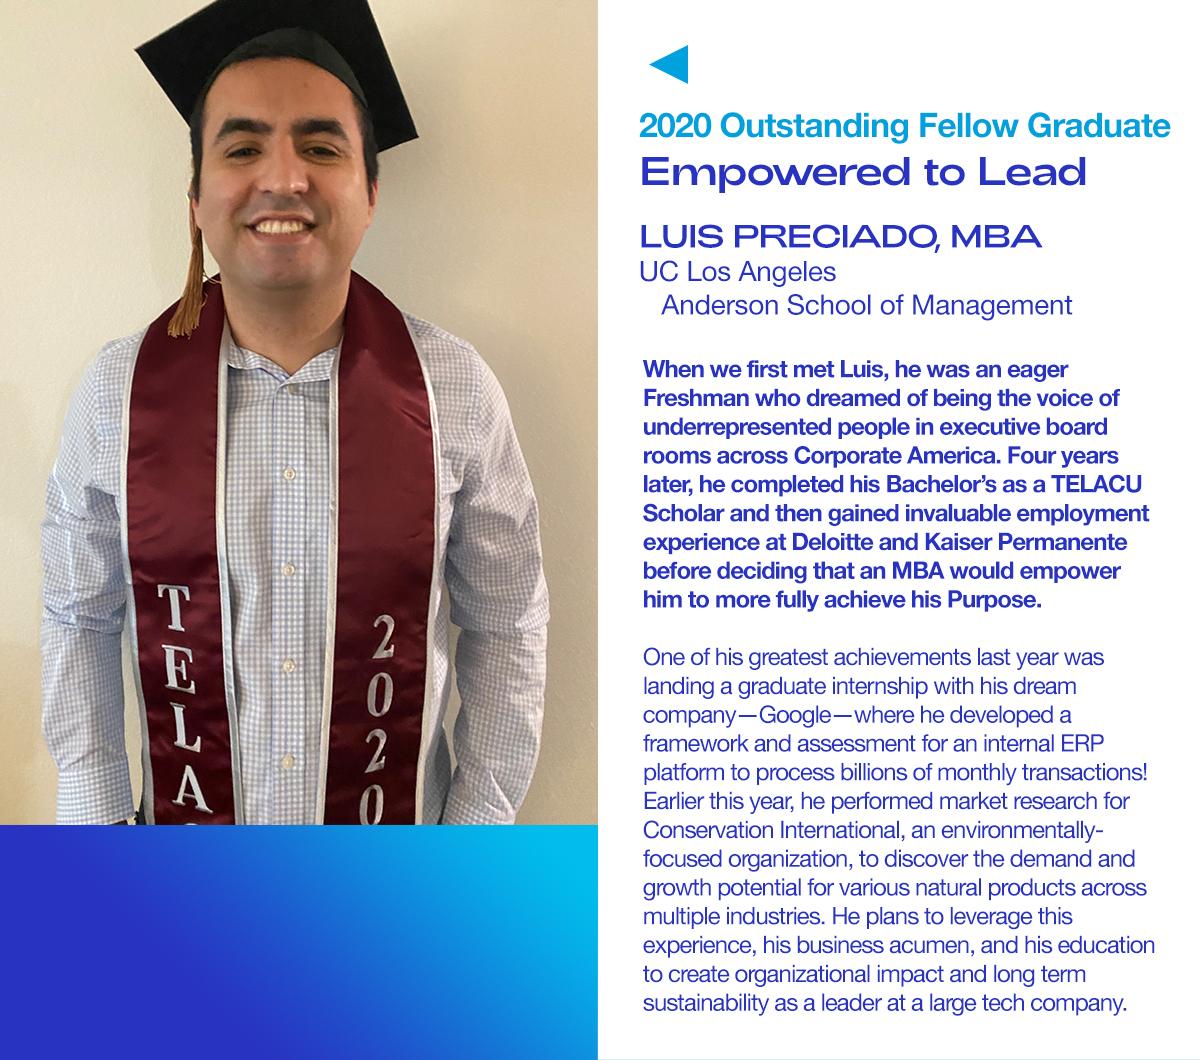 2020 Outstanding Fellow Graduate Luis Preciado